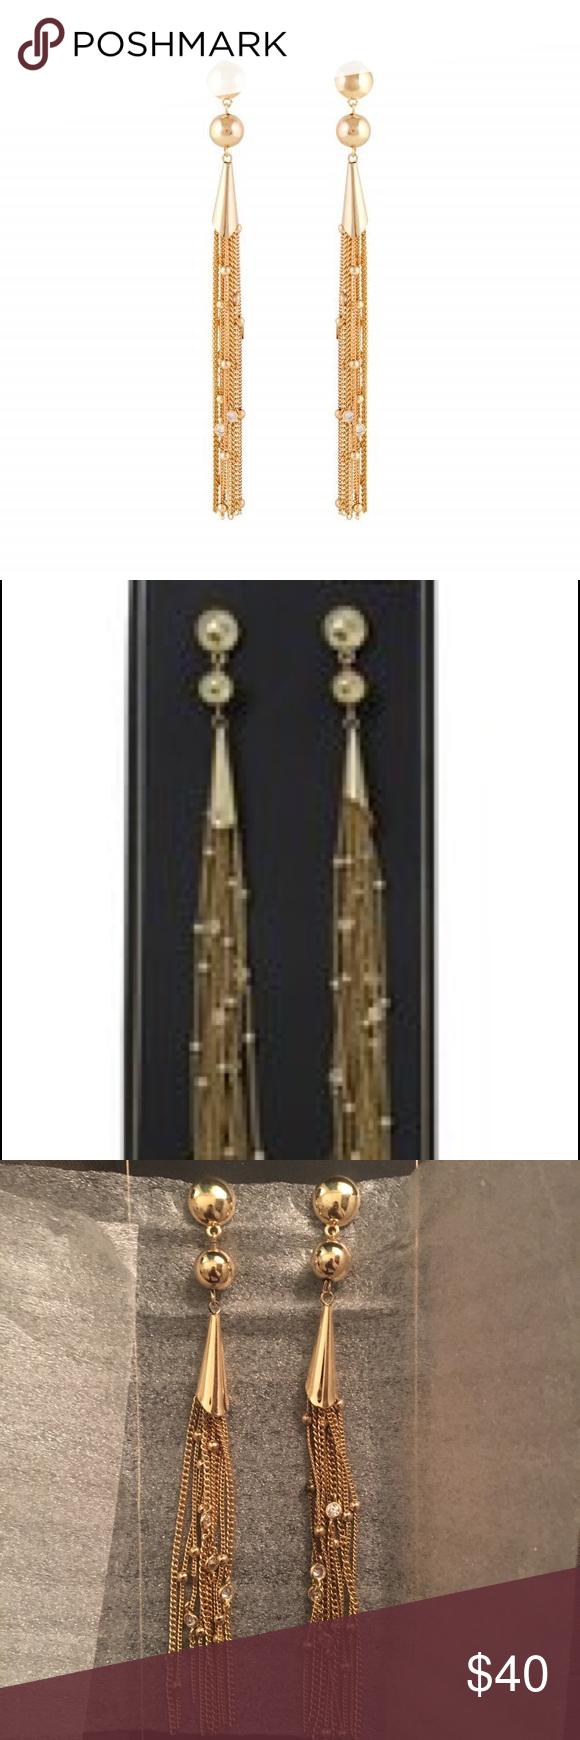 6f5b7e4f0 Ettika Crystal Drop Earrings Box of Style Ettika Crystal Drop Earrings in Gold  ettika Jewelry Earrings